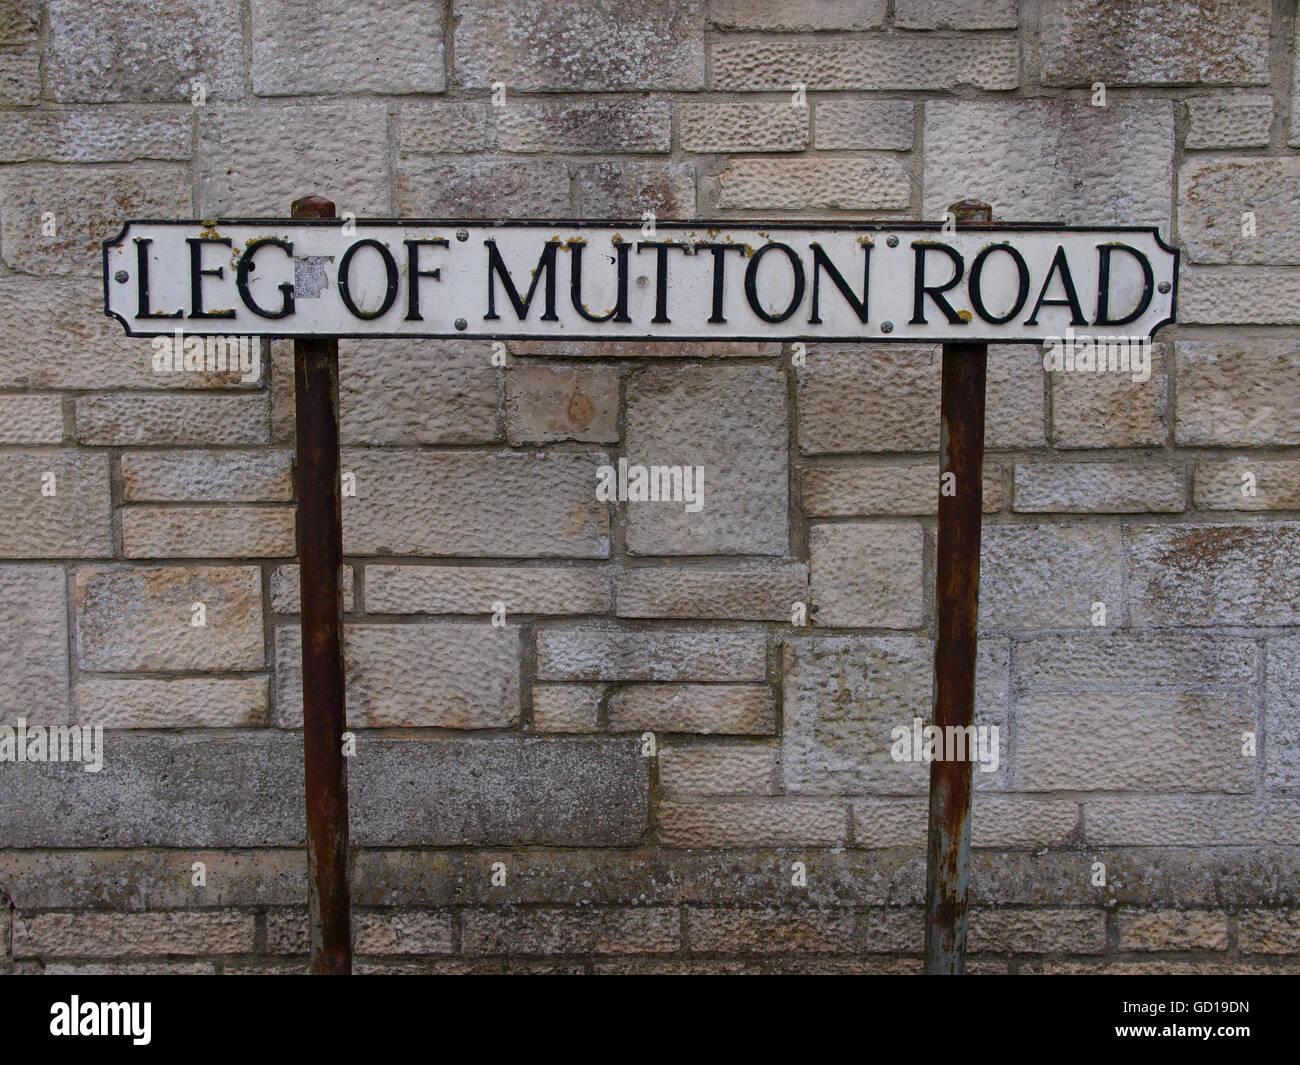 Unusual road name, Leg of Mutton Road, Glastonbury, Somerset, UK - Stock Image